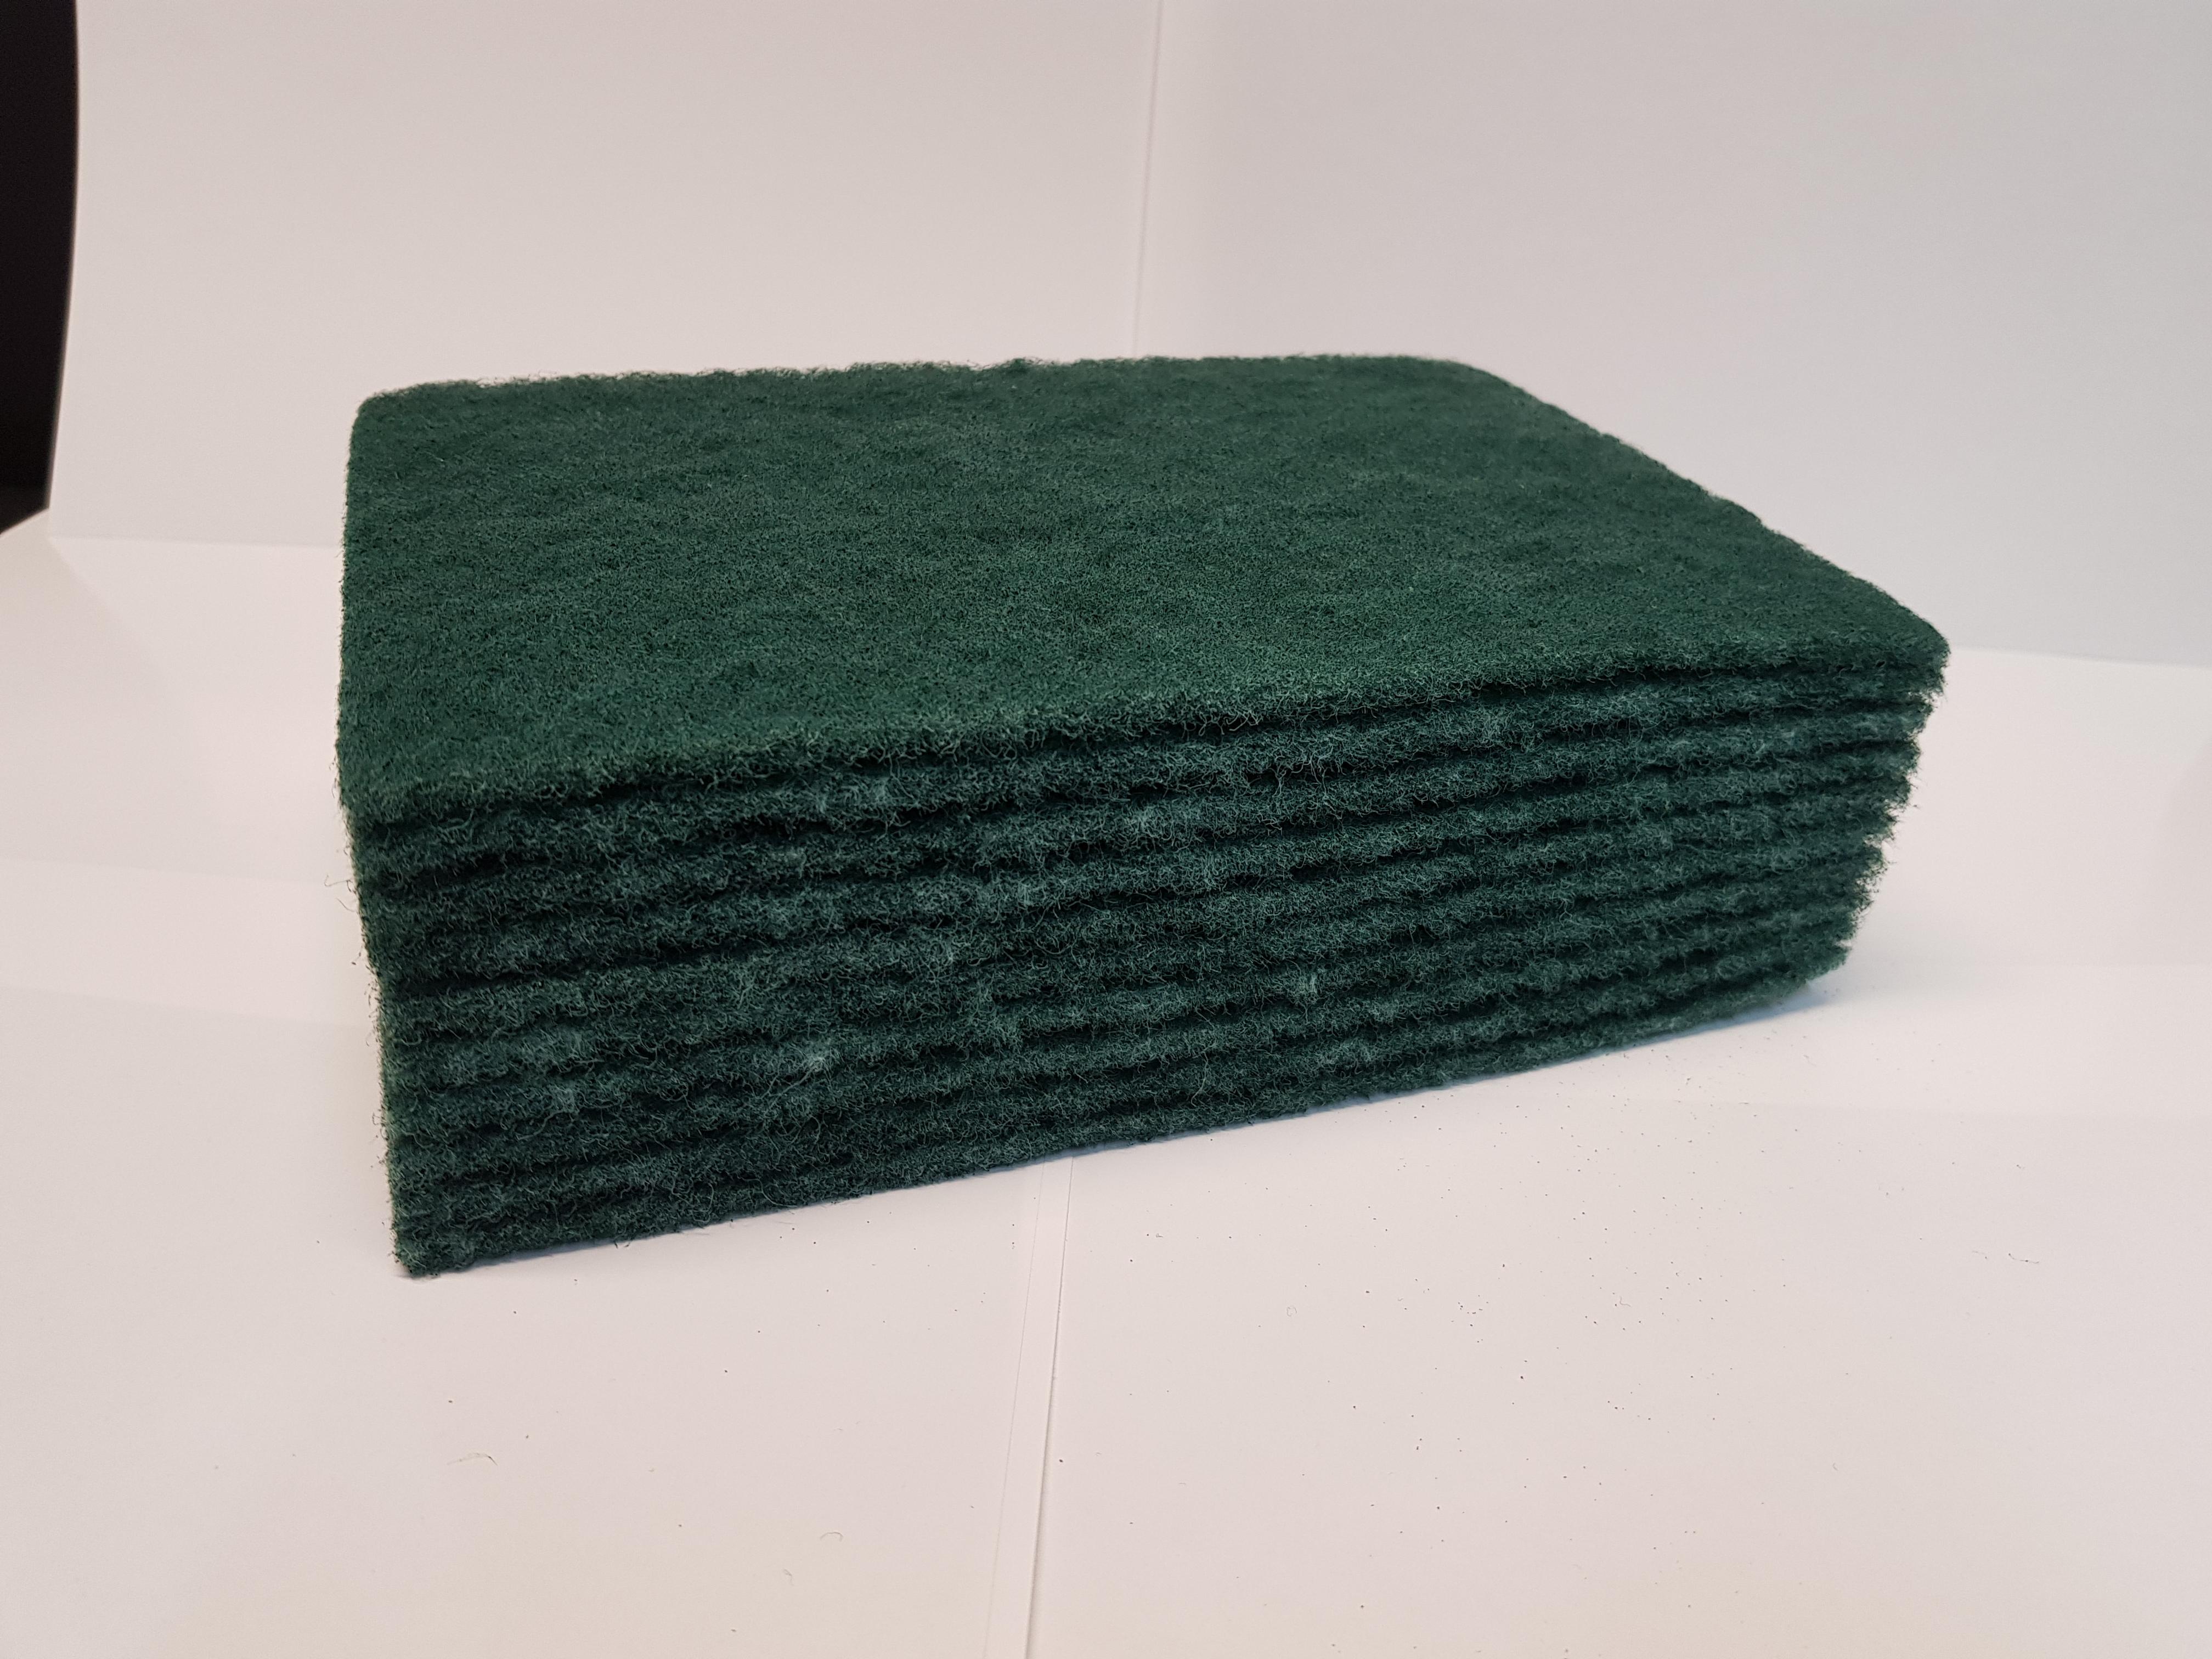 Everbrite coatings UK Green Scourer x 10